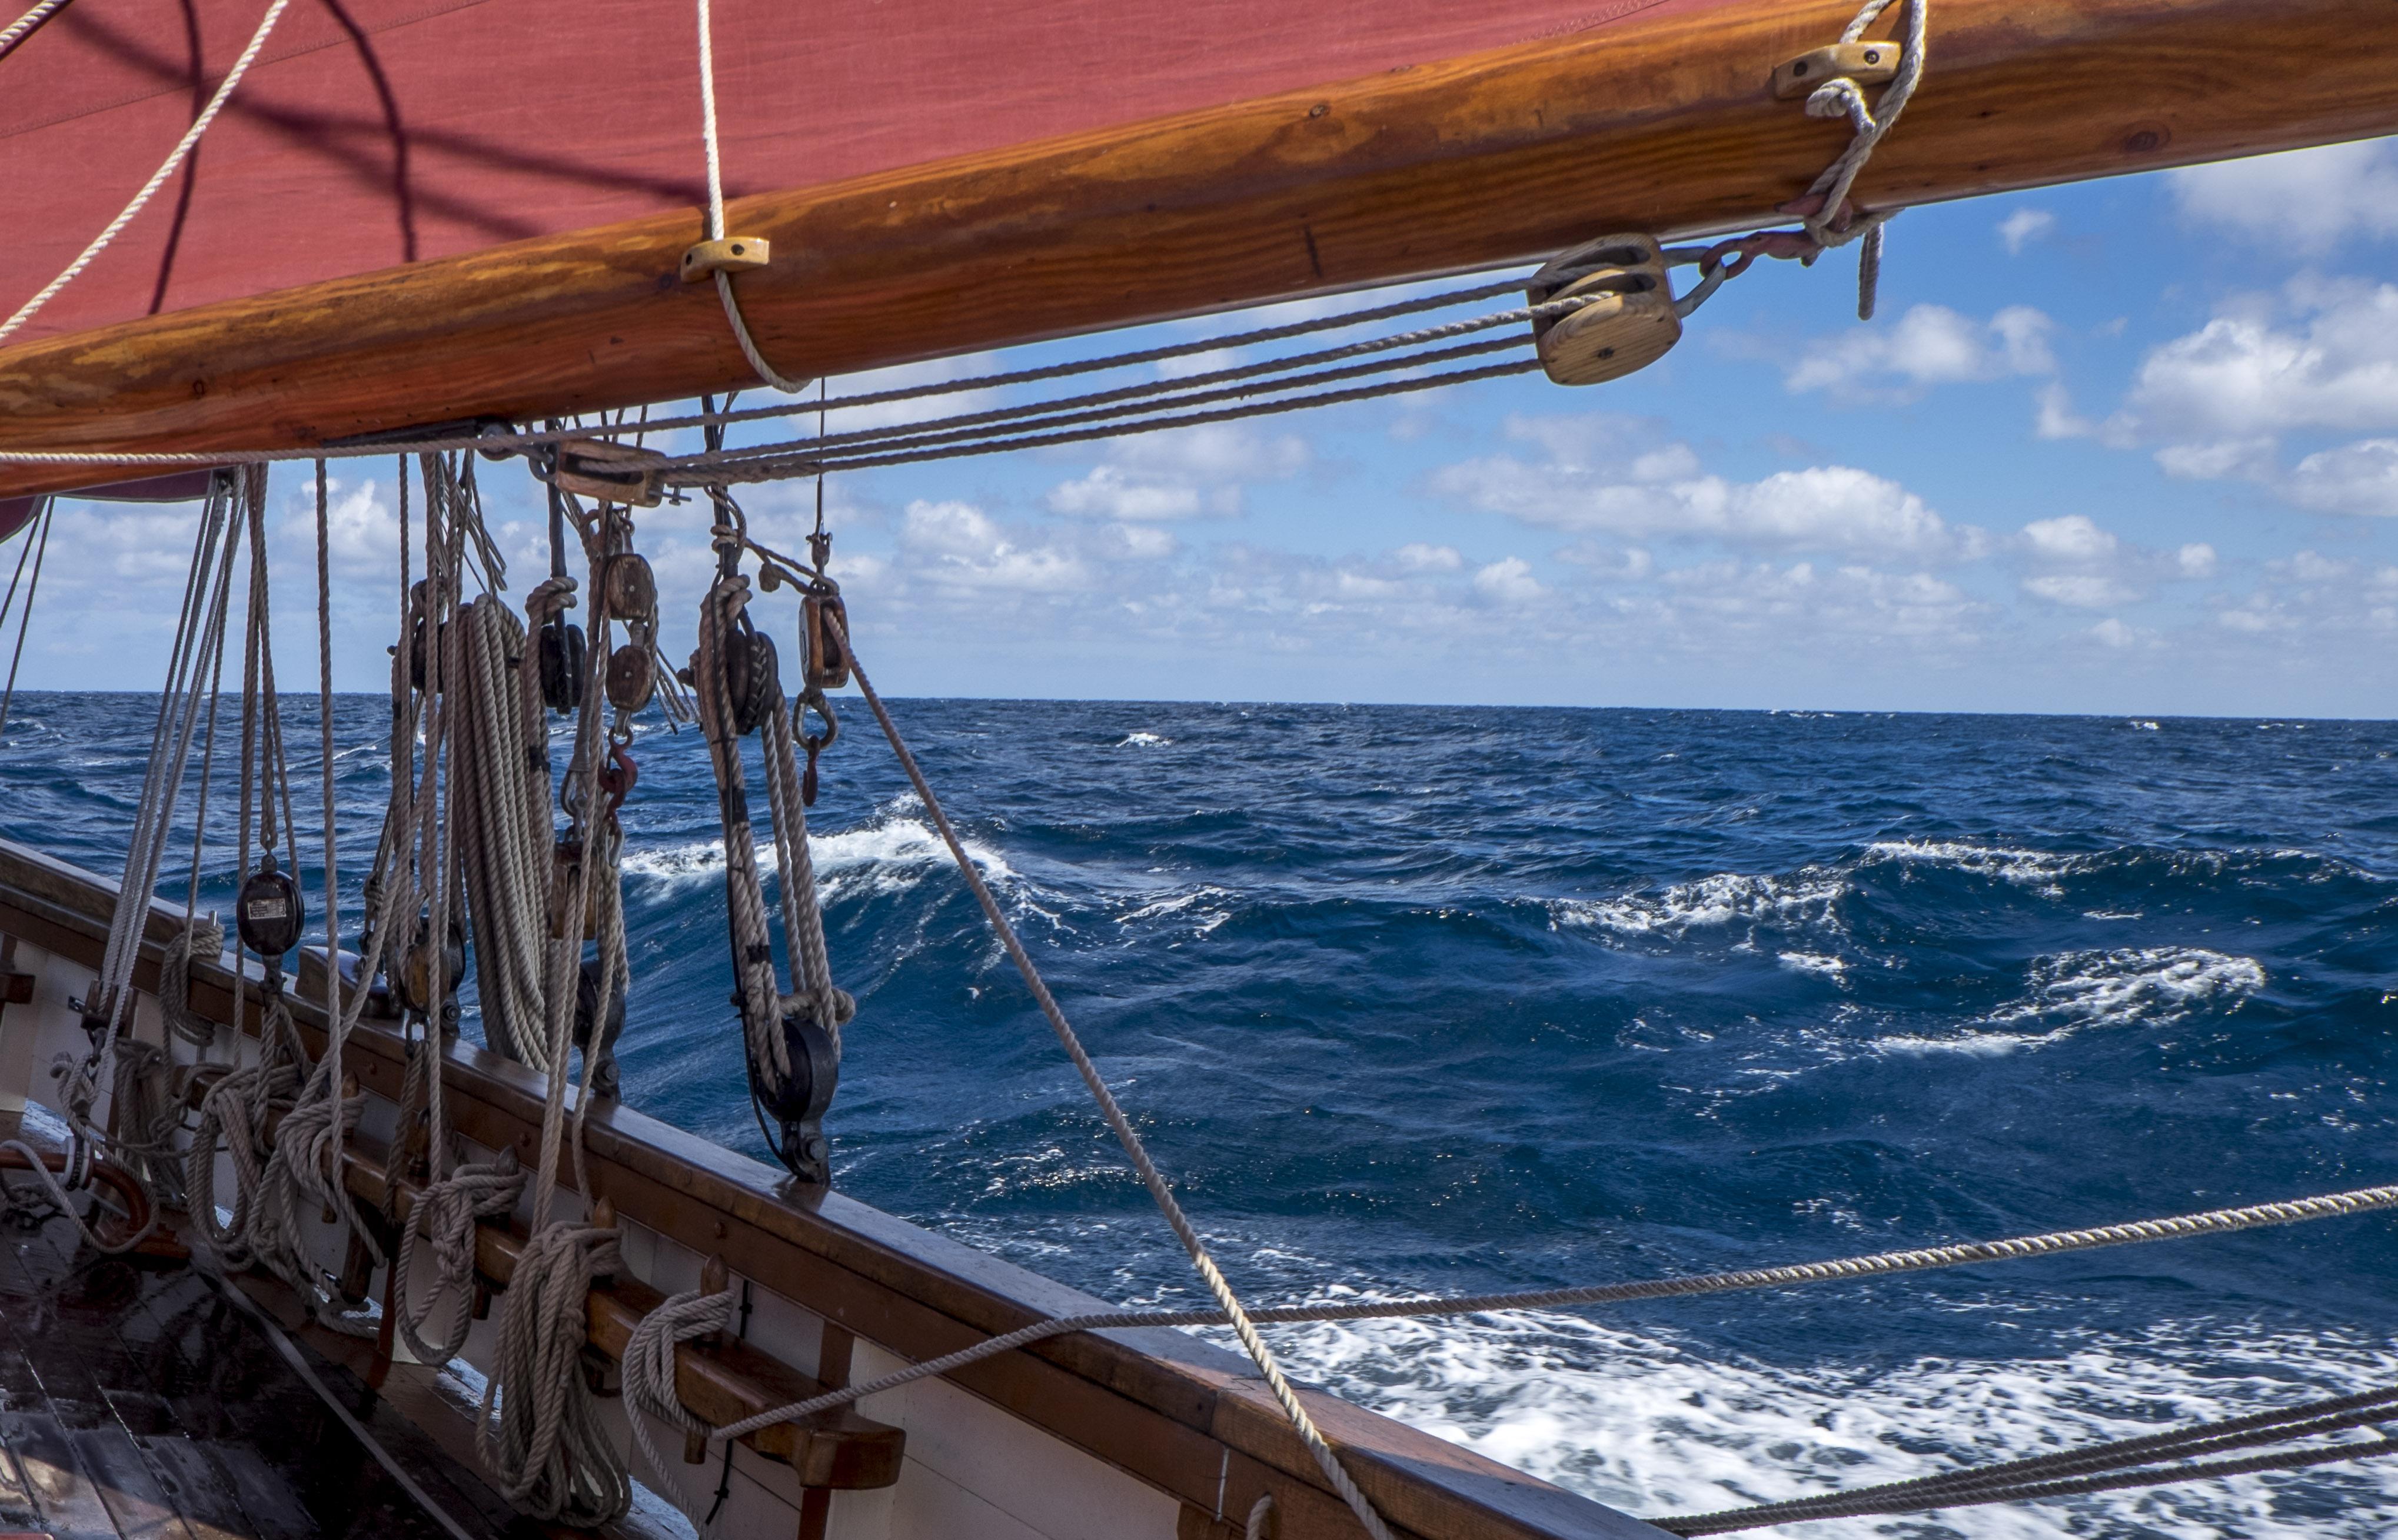 Offshore sailing on Pilgrim - she's a big seaworthy girl